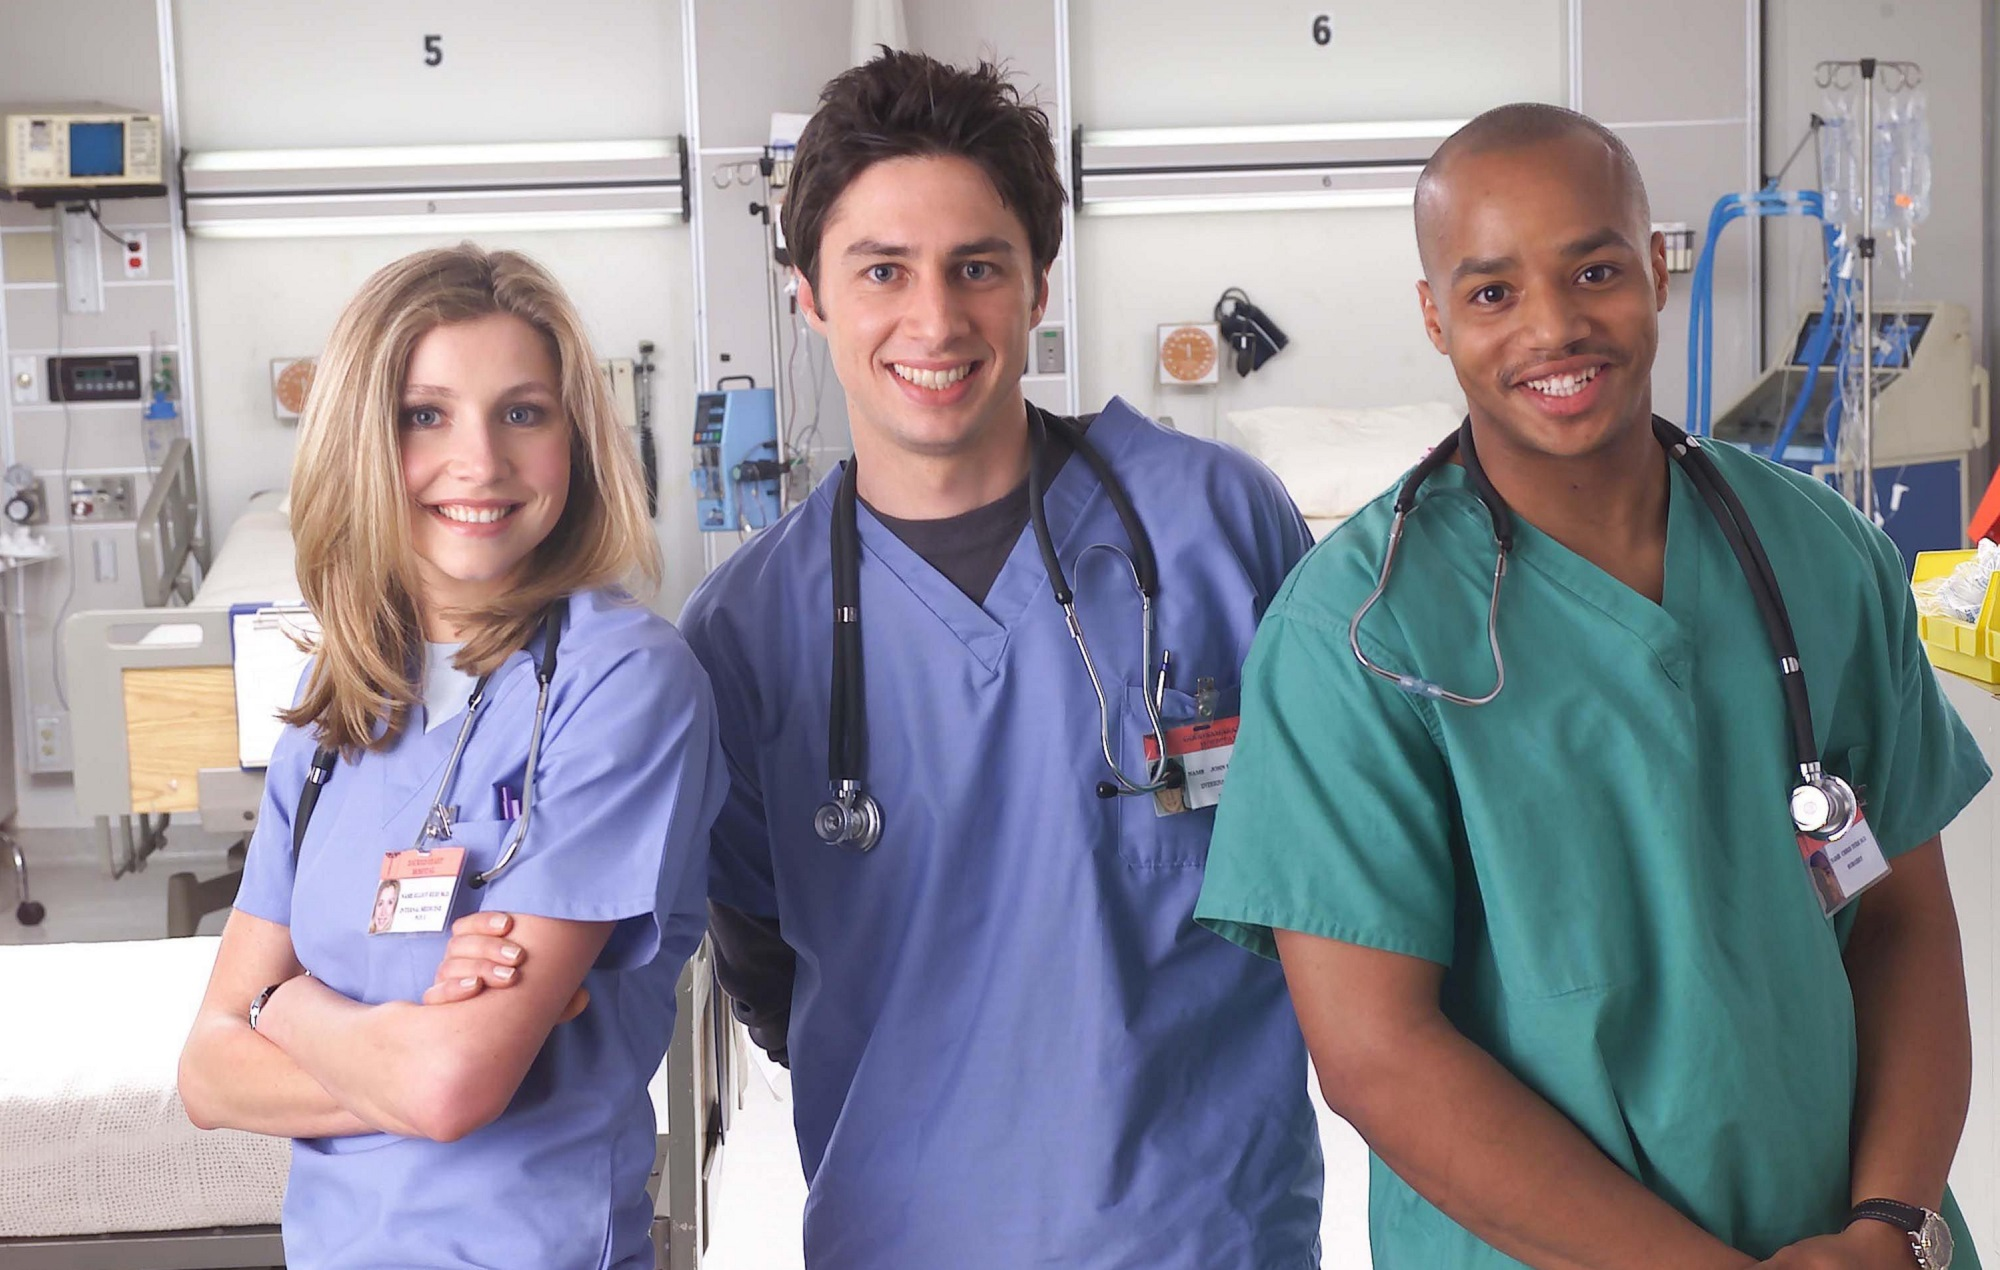 'Scrubs' star Sarah Chalke details upcoming virtual cast reunion